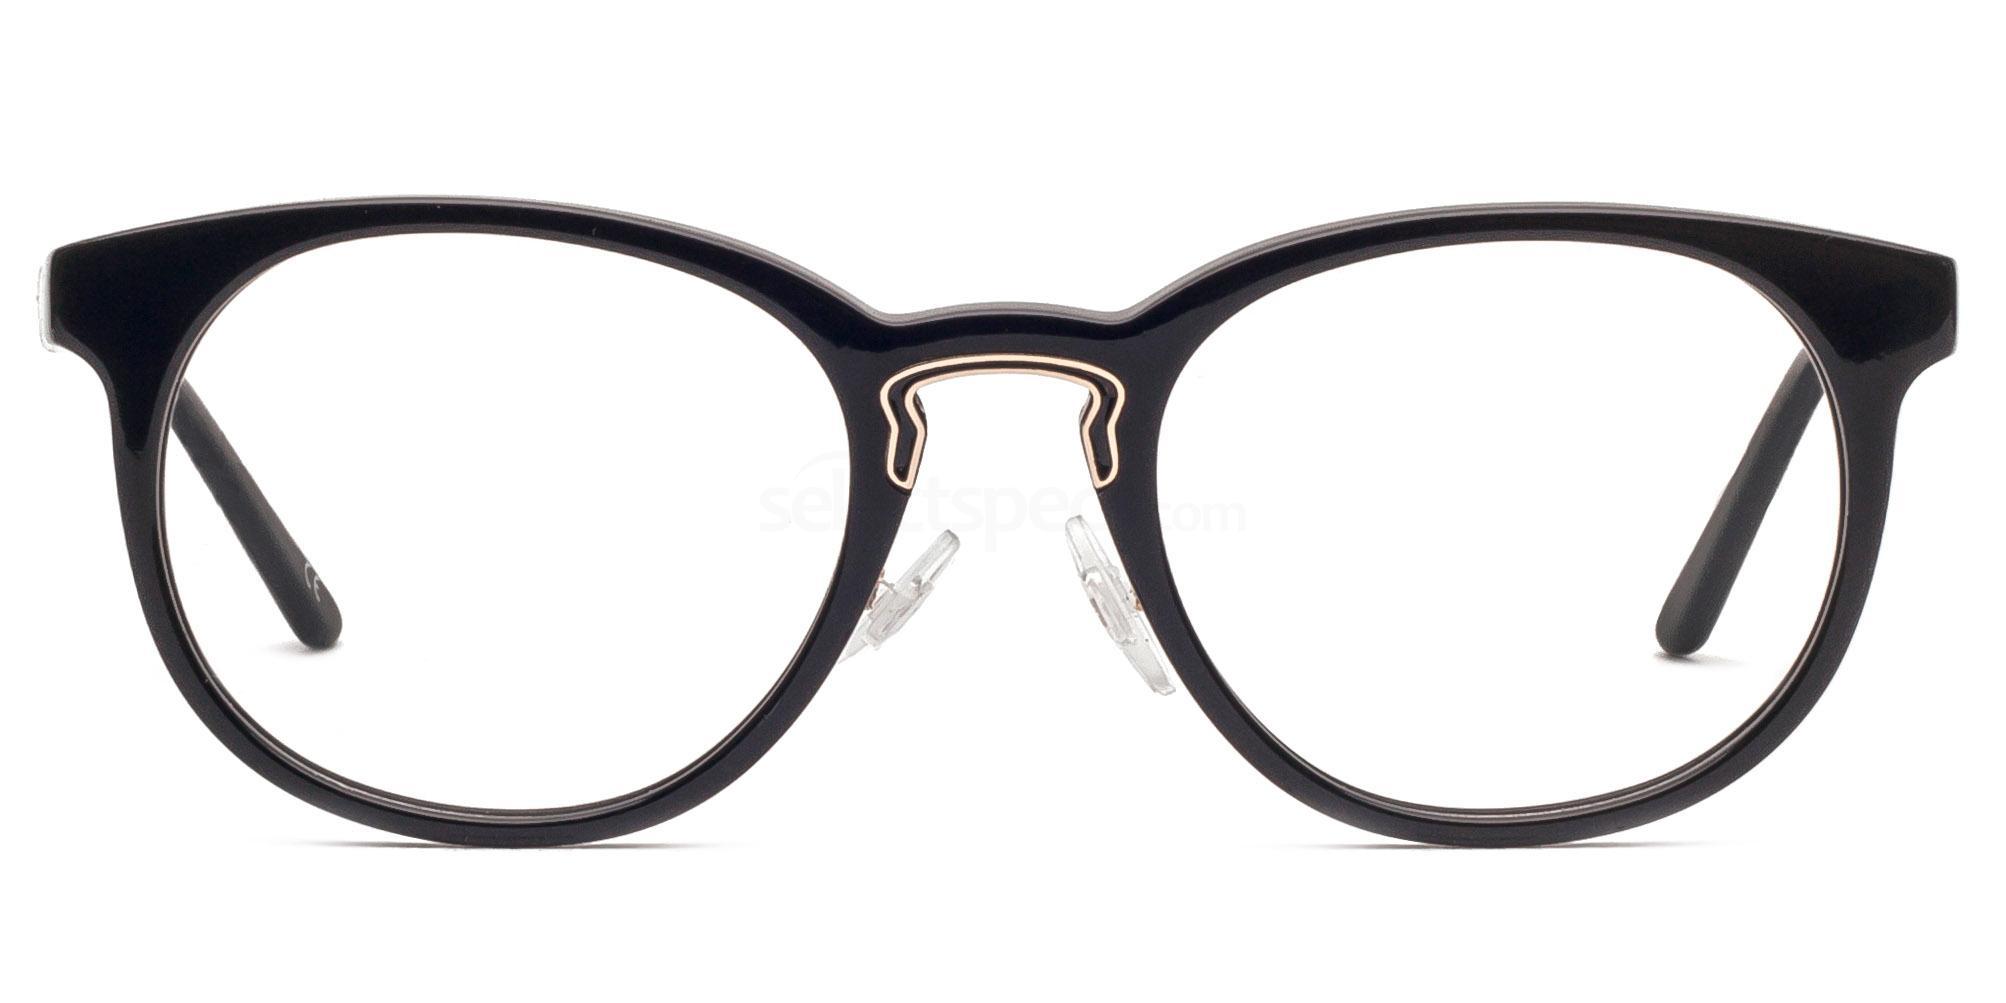 C1 SRA166 Glasses, Infinity